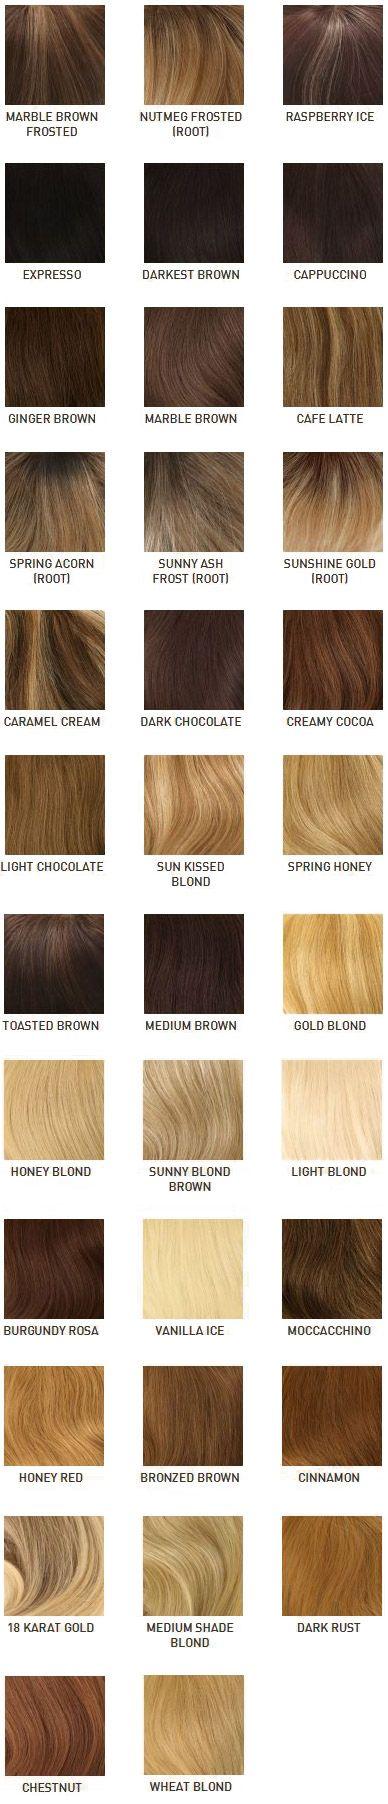 human hair color inheritance chart - Google Search Genetics - sample hair color chart